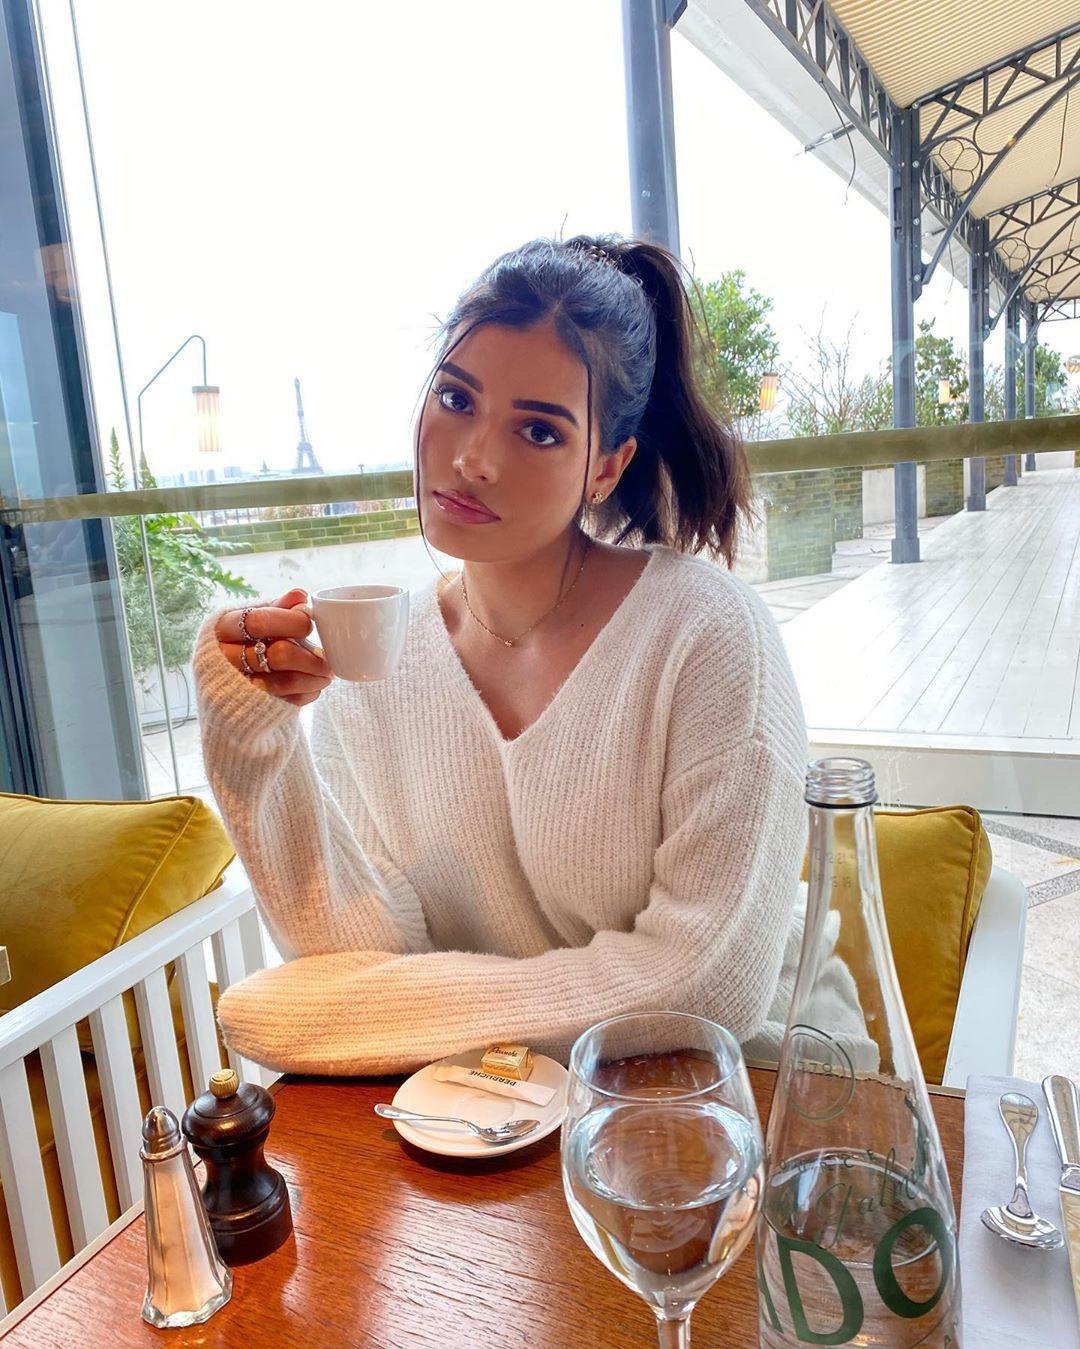 Daniella Salvi, tableware, breakfast, drinking